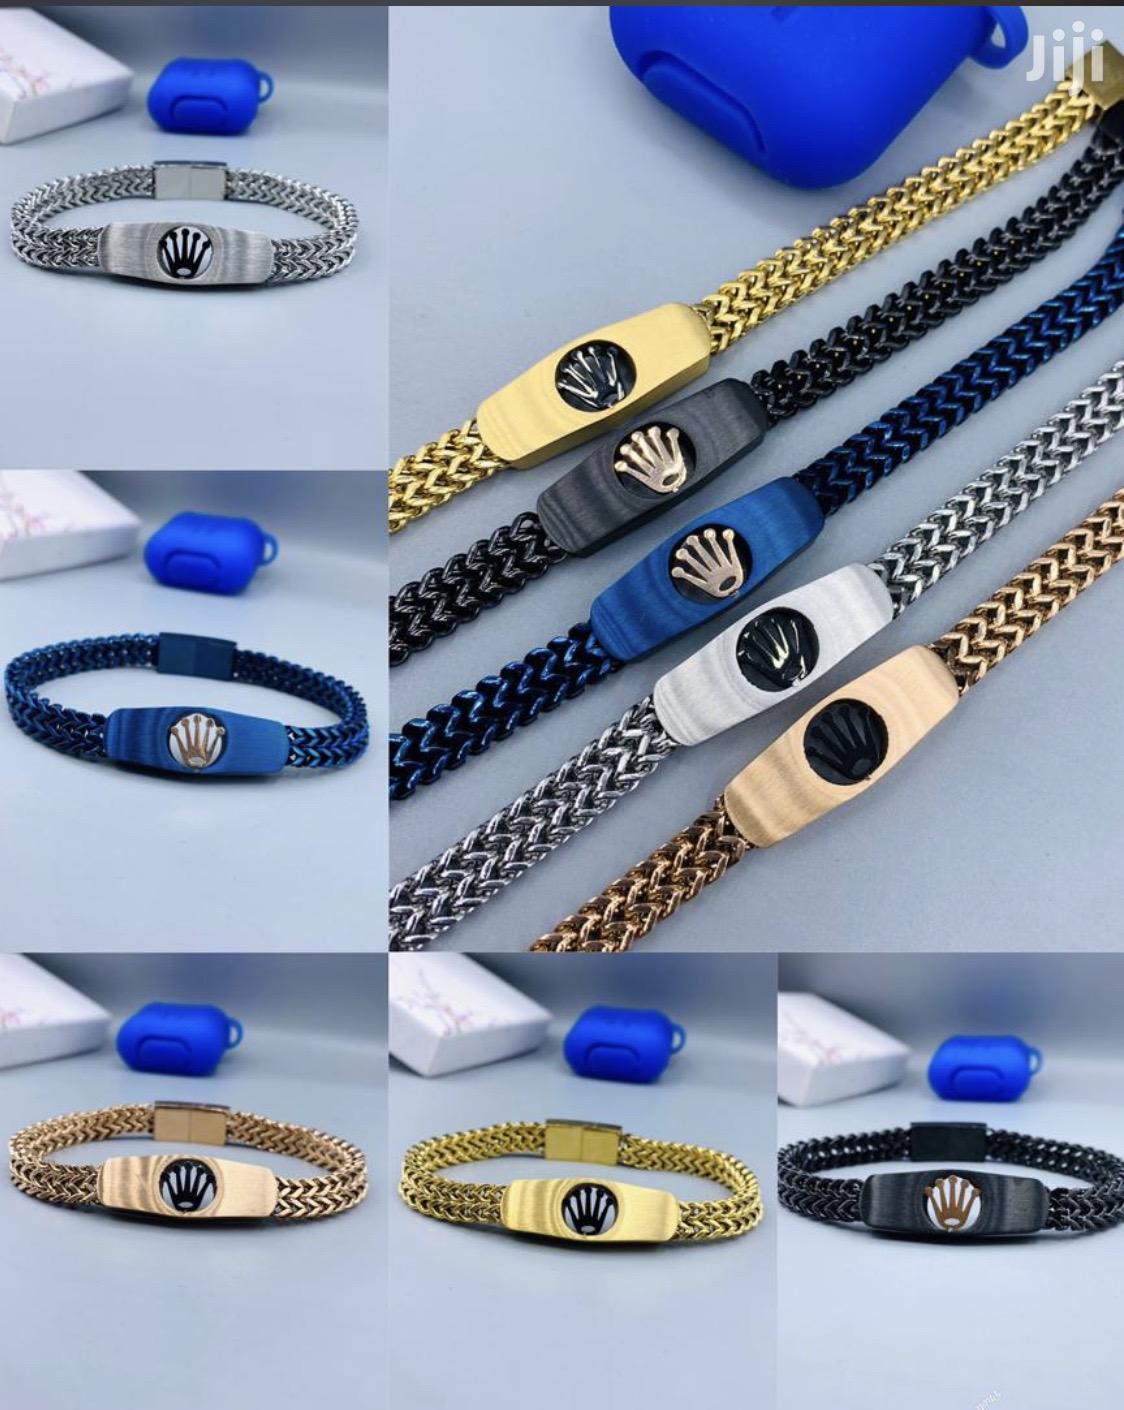 Versace Bracelet | Jewelry for sale in East Legon, Greater Accra, Ghana